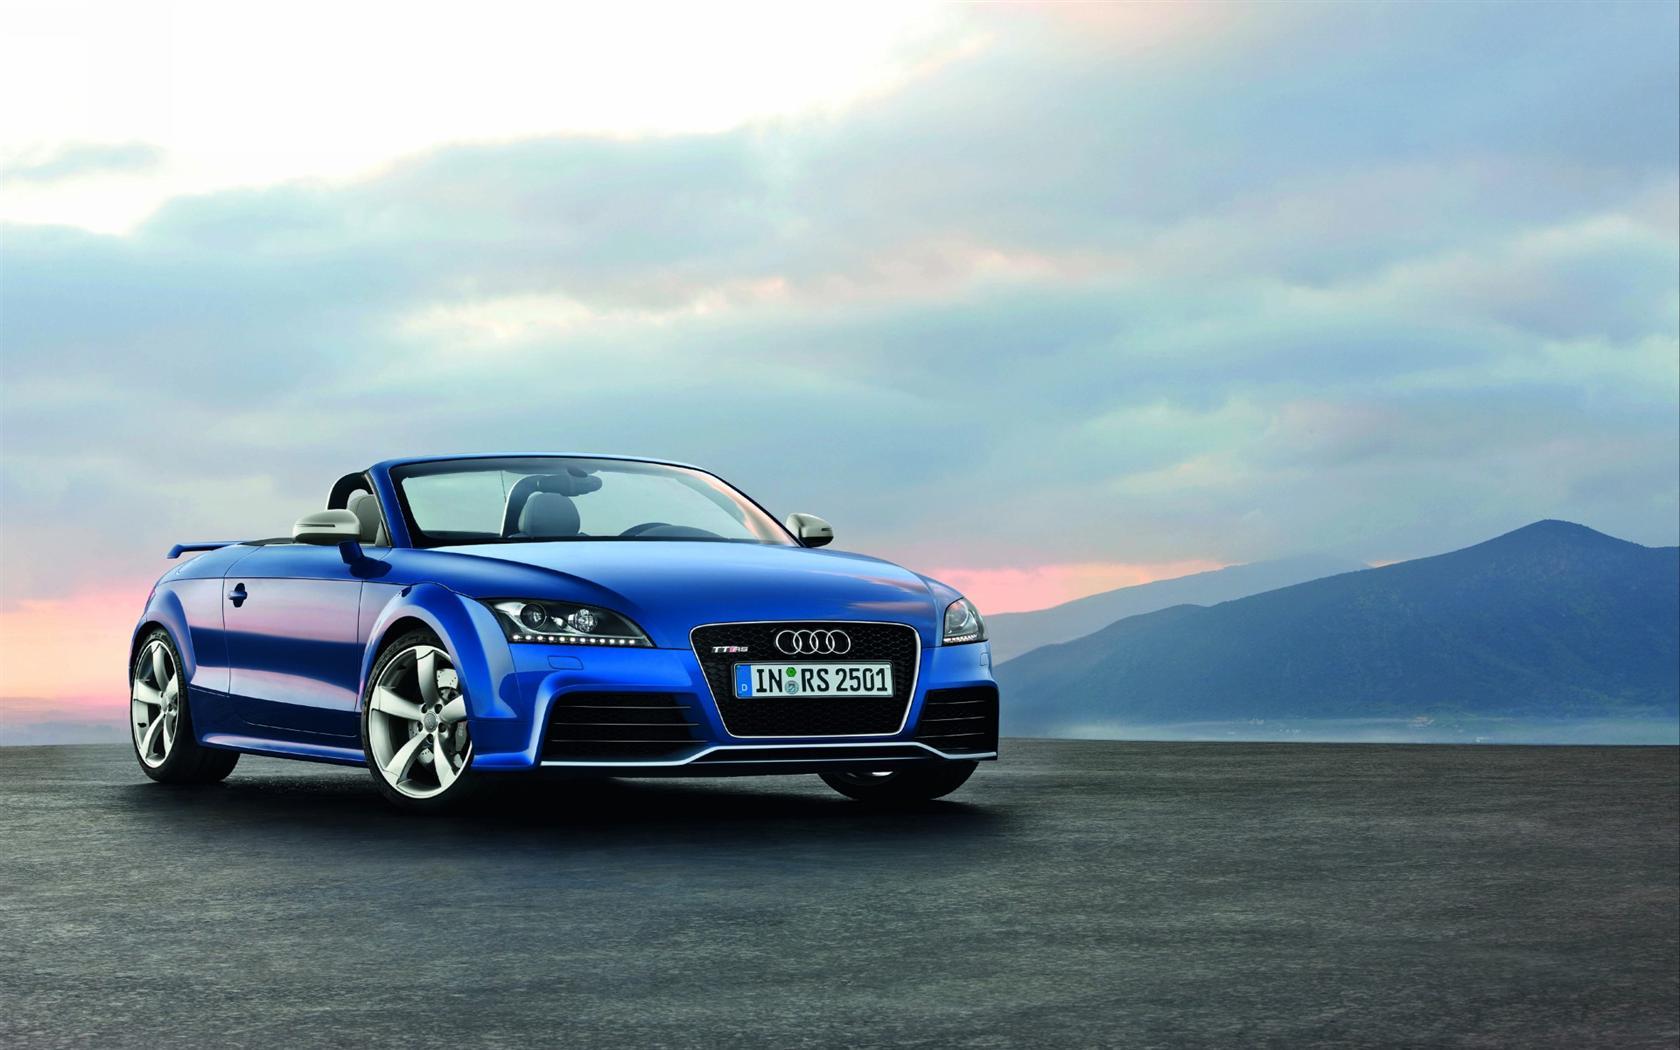 2010 Audi TT RS Image